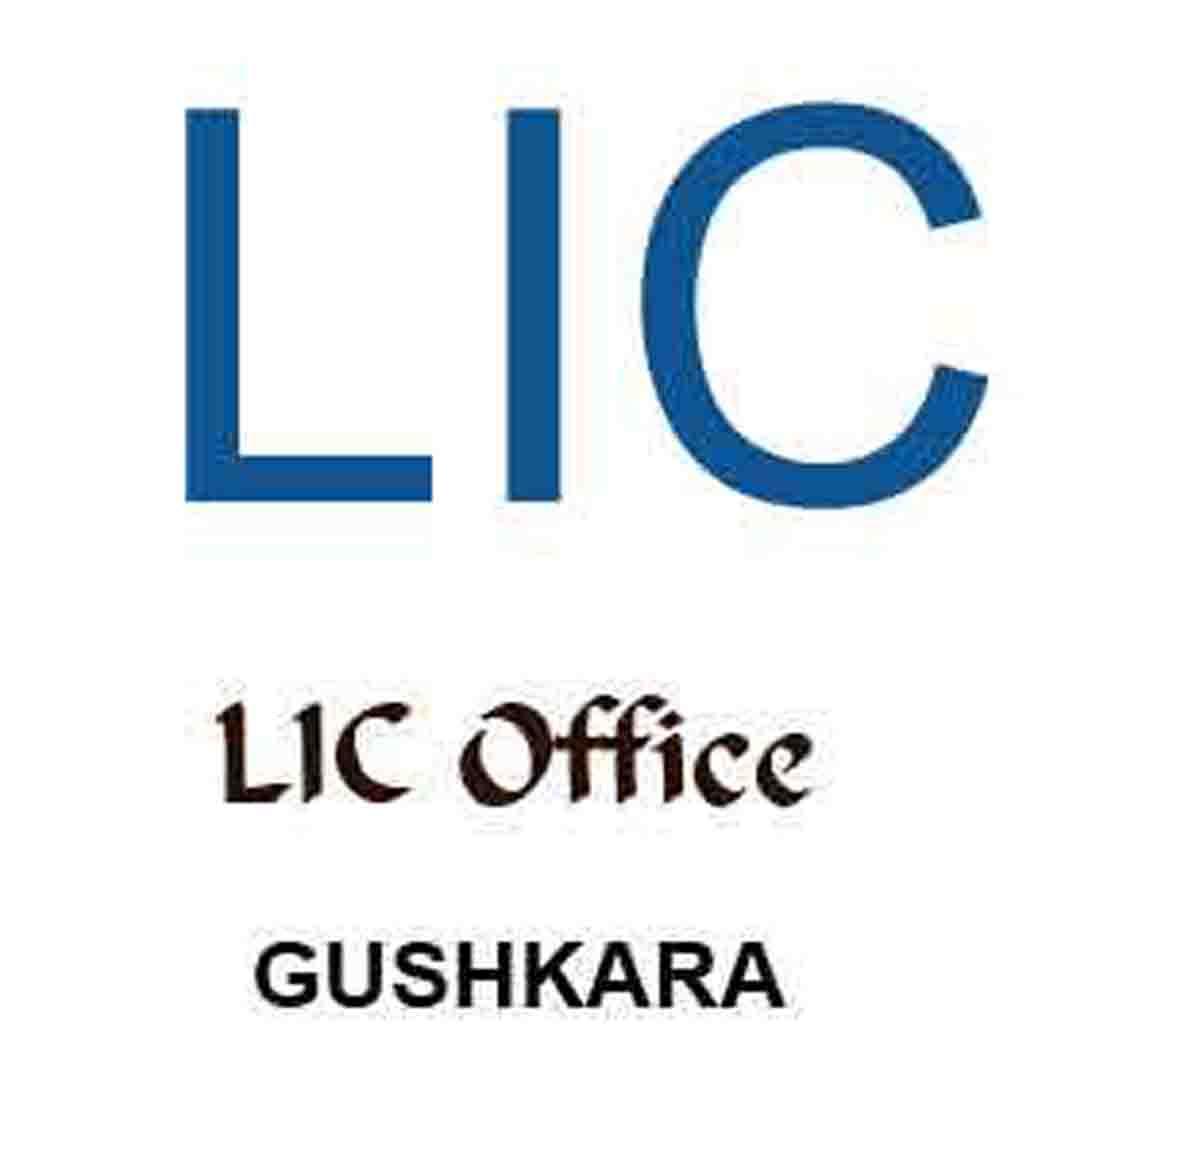 lic office gushkara